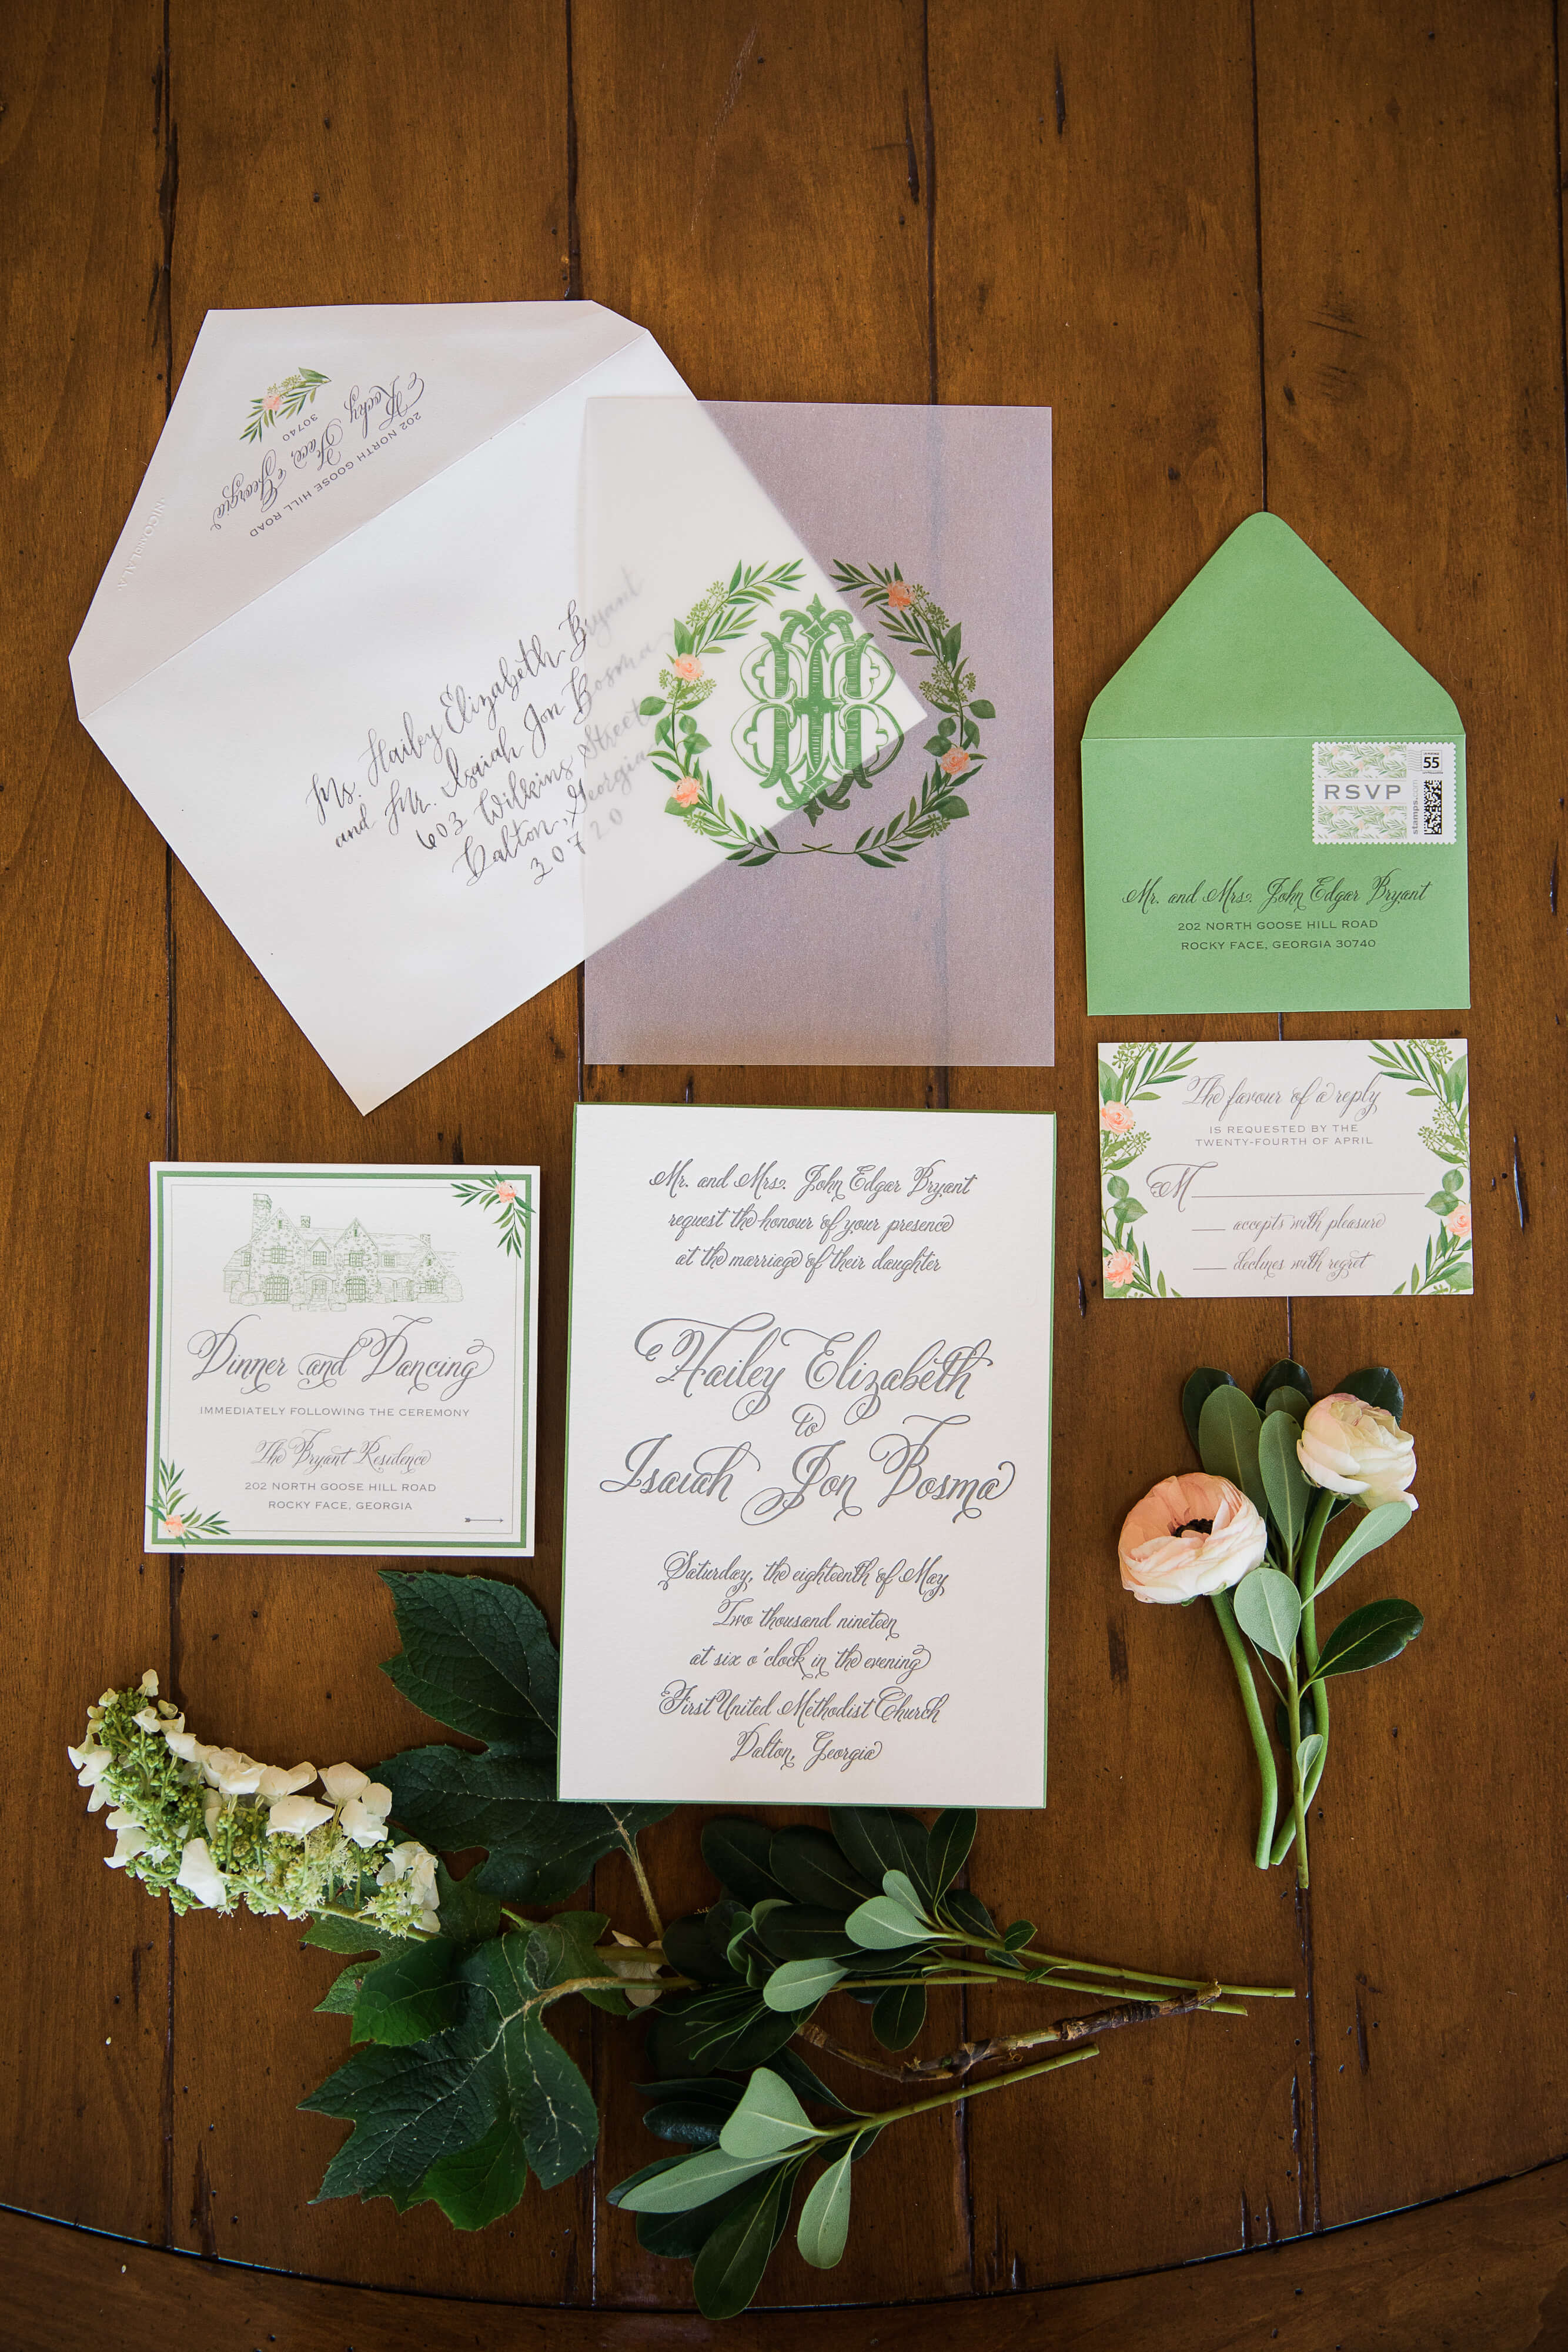 southern watercolor wedding suite with interlocking monogram